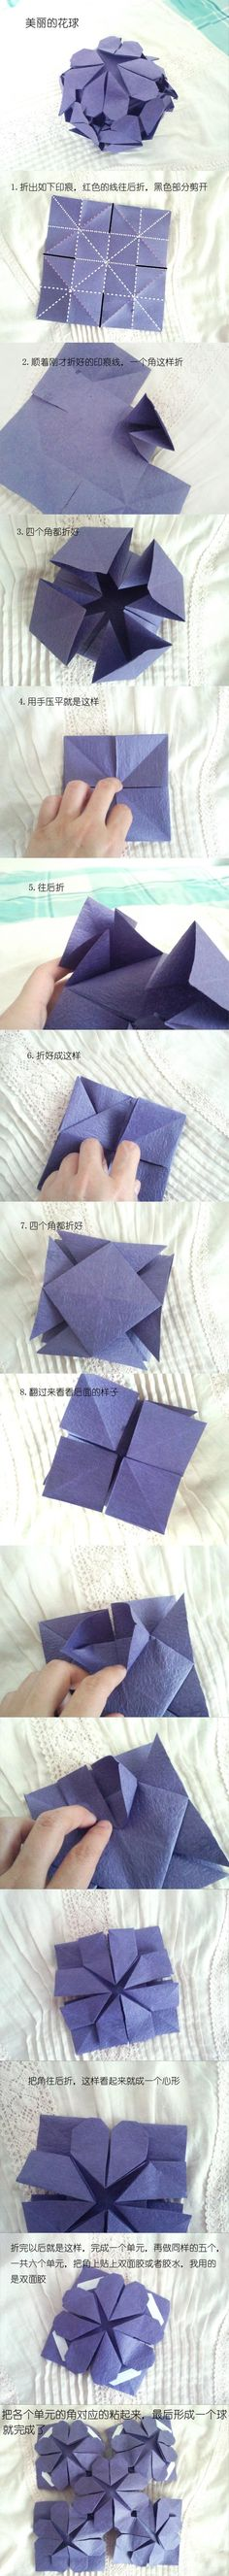 Origami heart<3